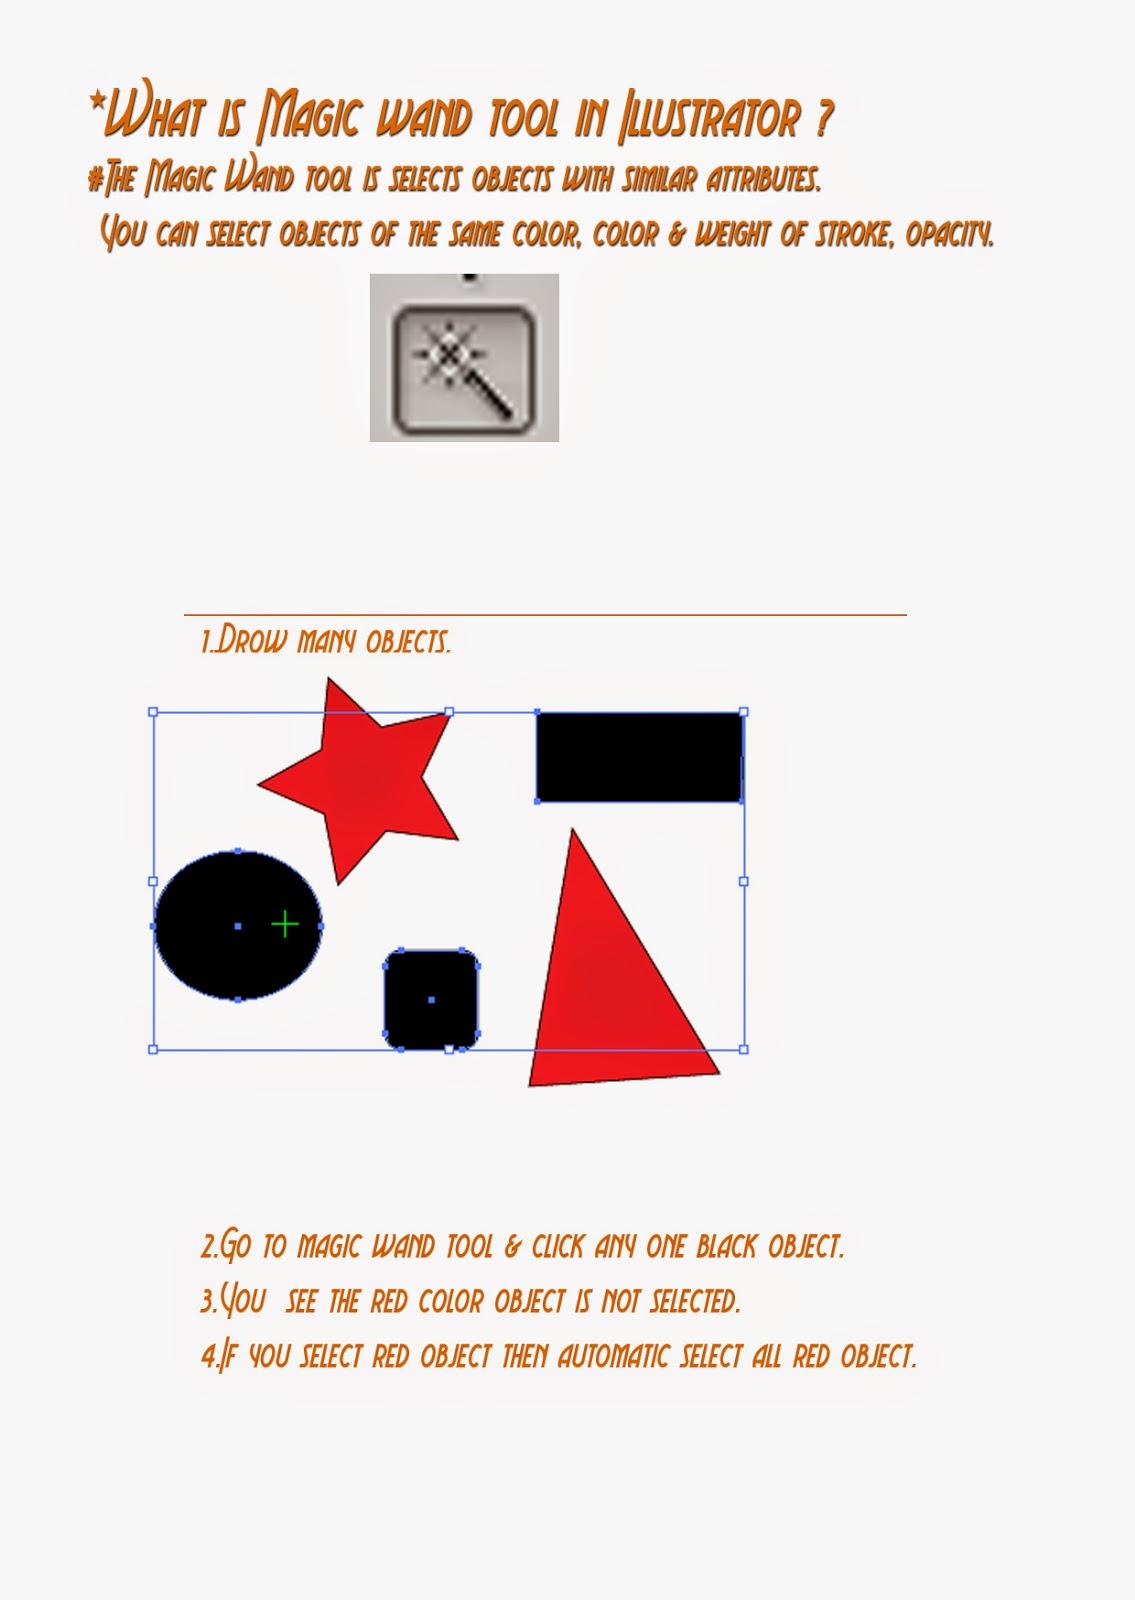 Magic Wand Tool Illustrator